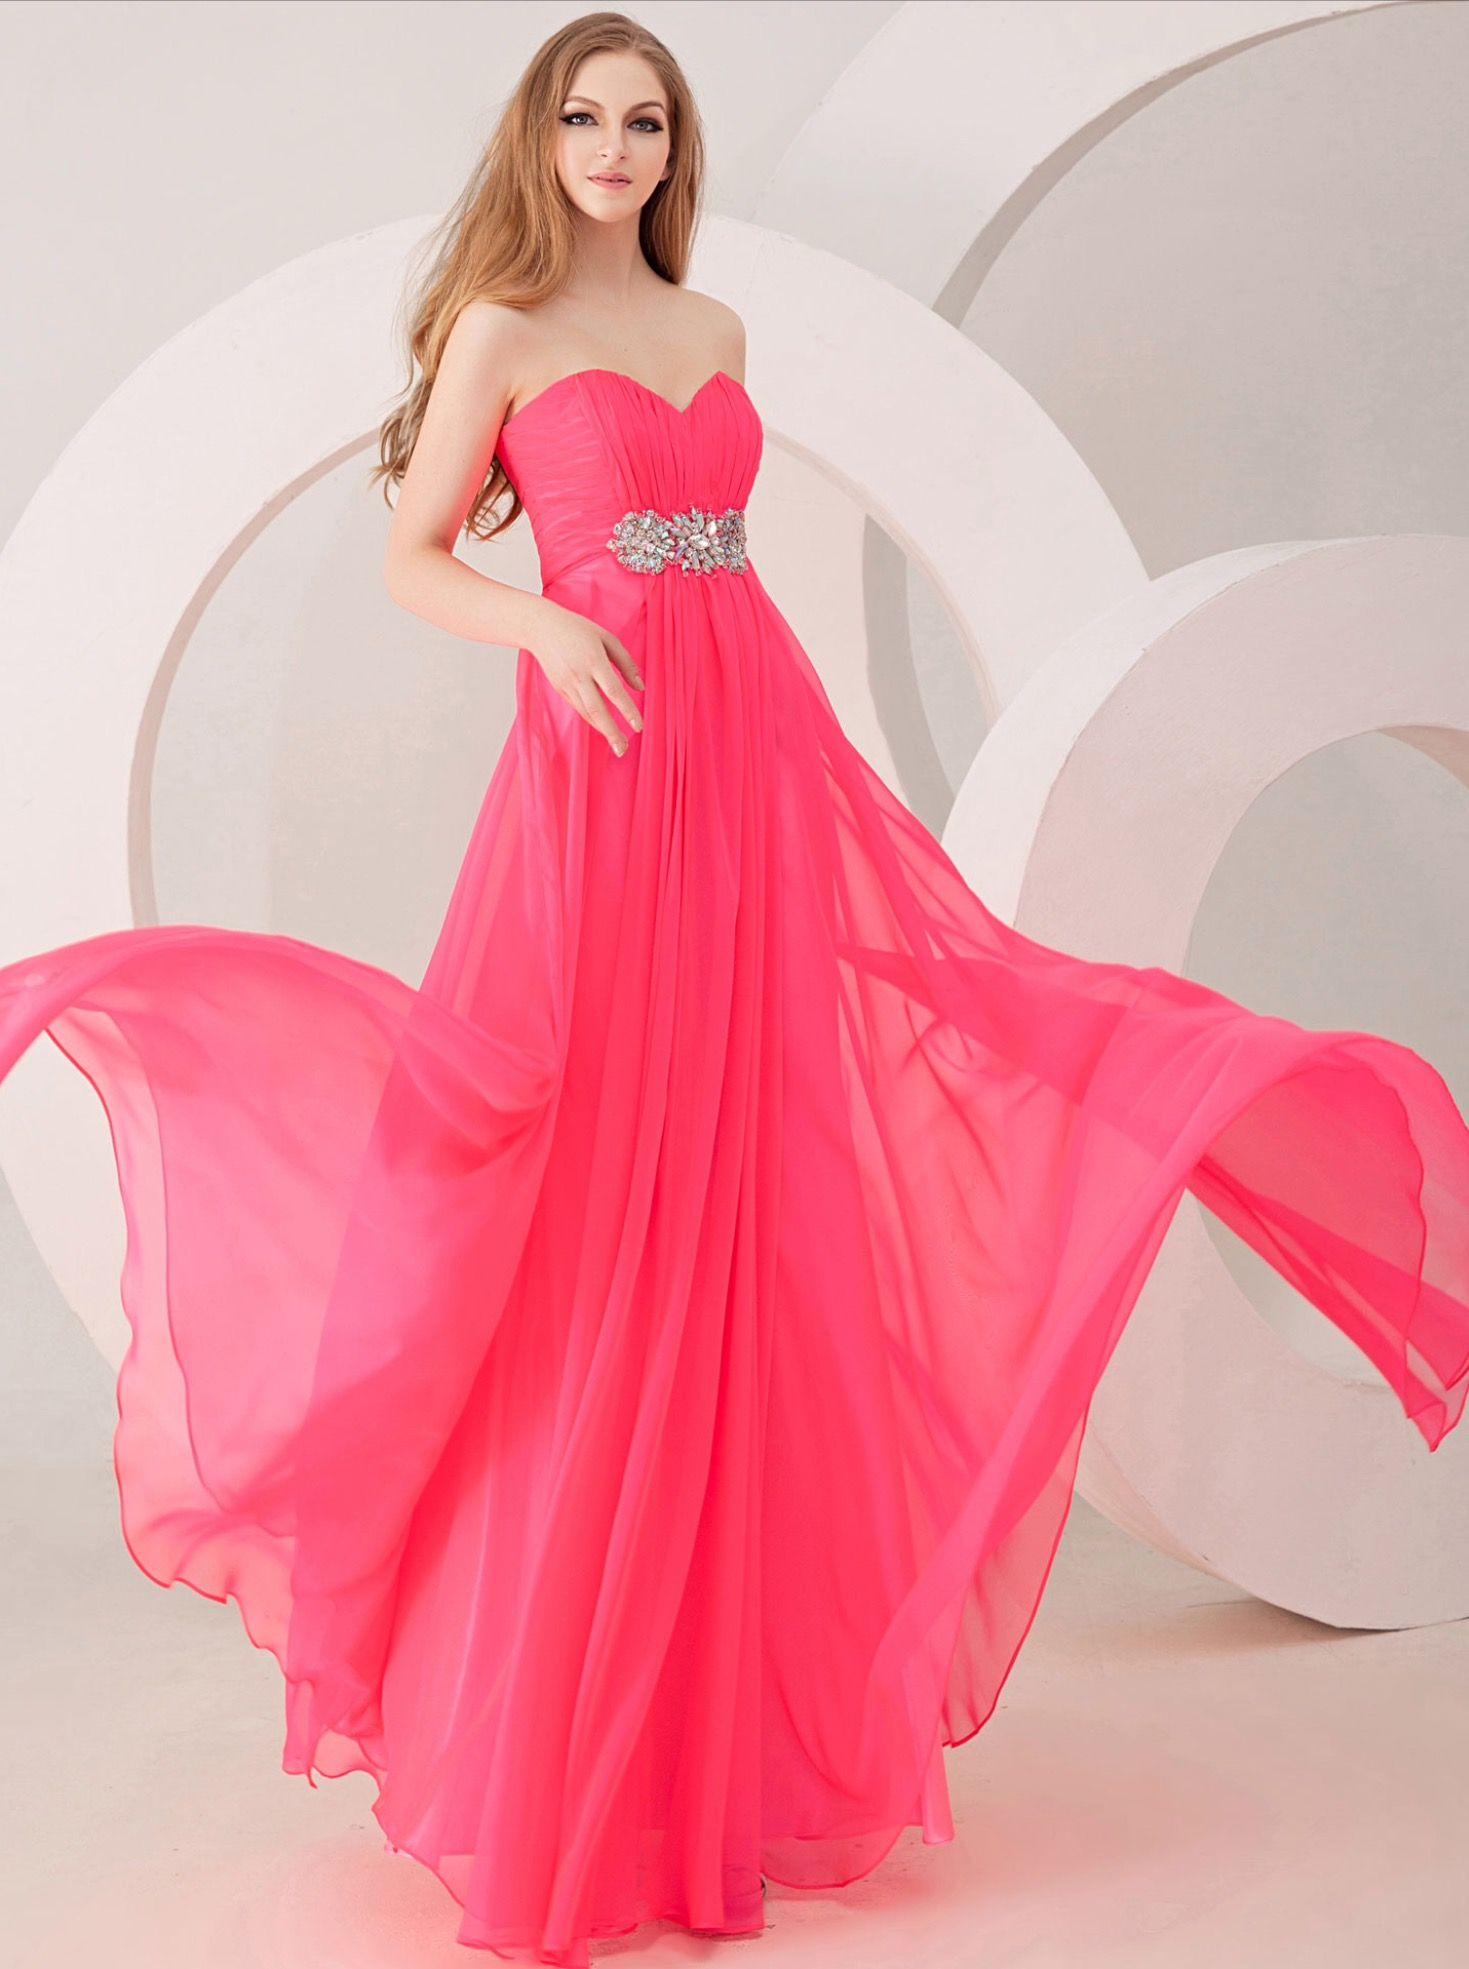 Pin de Airra en Dresses | Pinterest